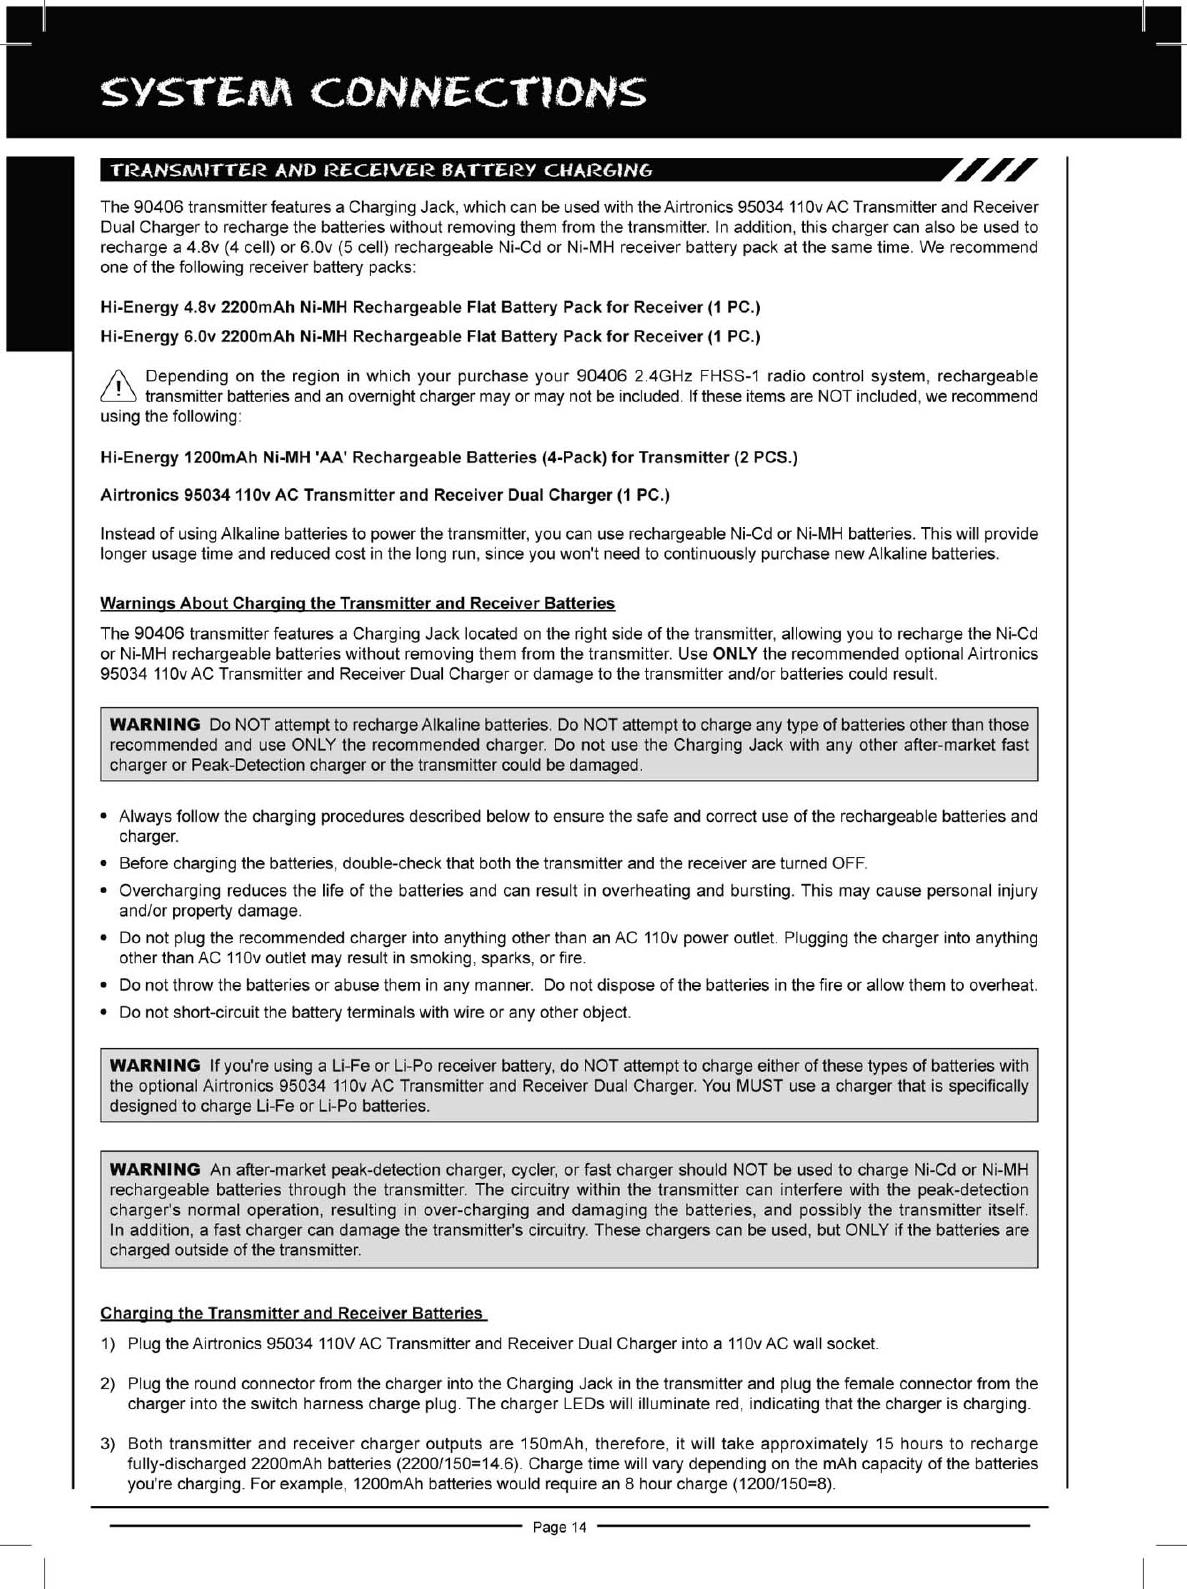 Sanwa Electronic Instrument Co 90406 Radio Control User Manual 2 Of 4 Transmitterreceiverradiocontrolschematicdiagrampng